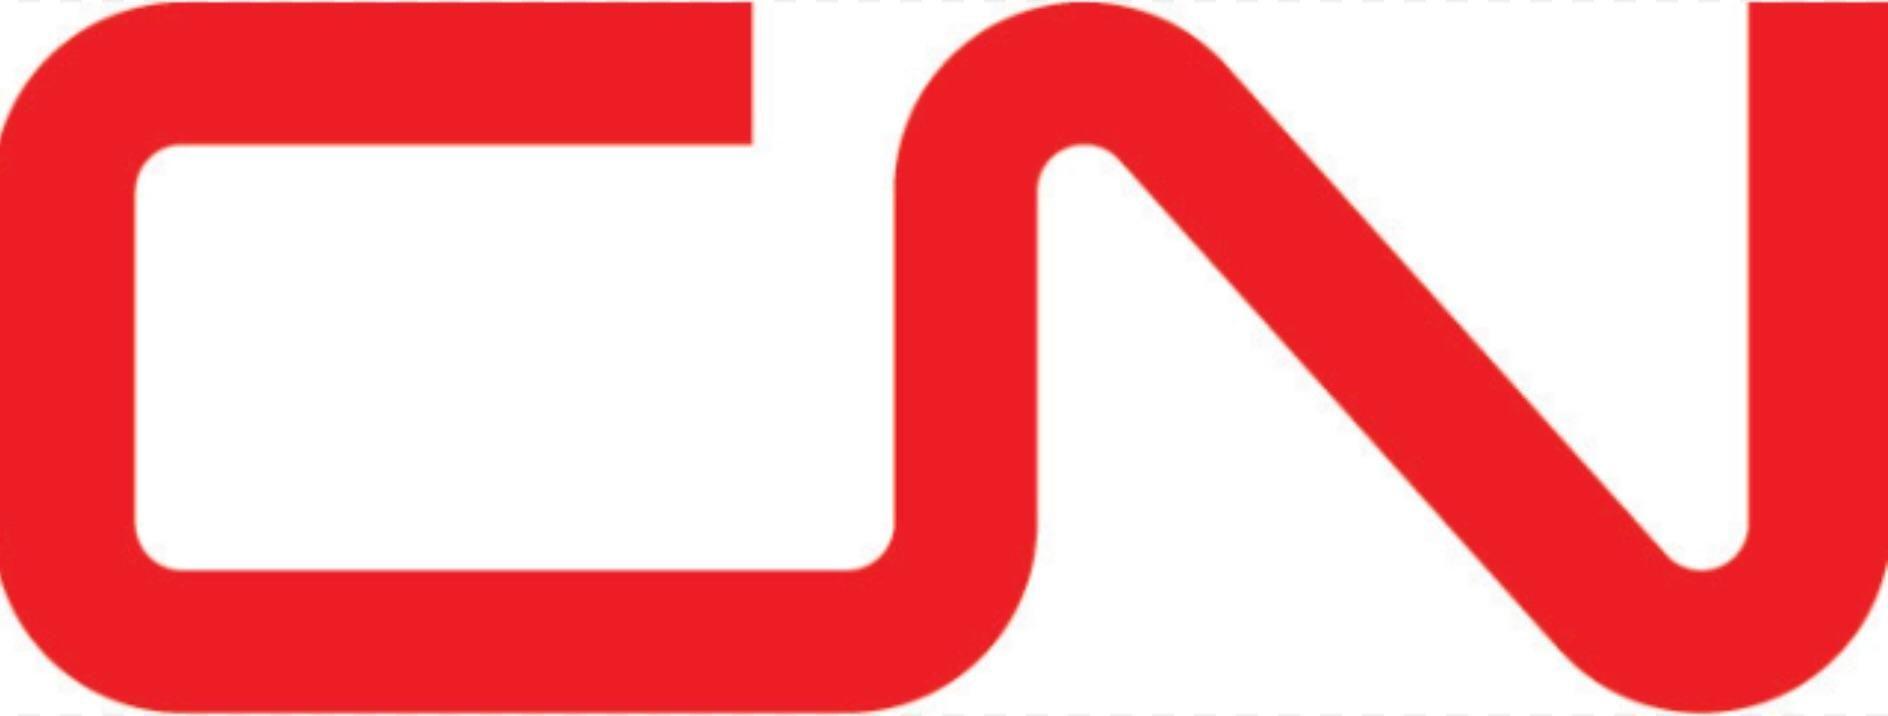 Canadian National Railway logo Alan Fleming 1960